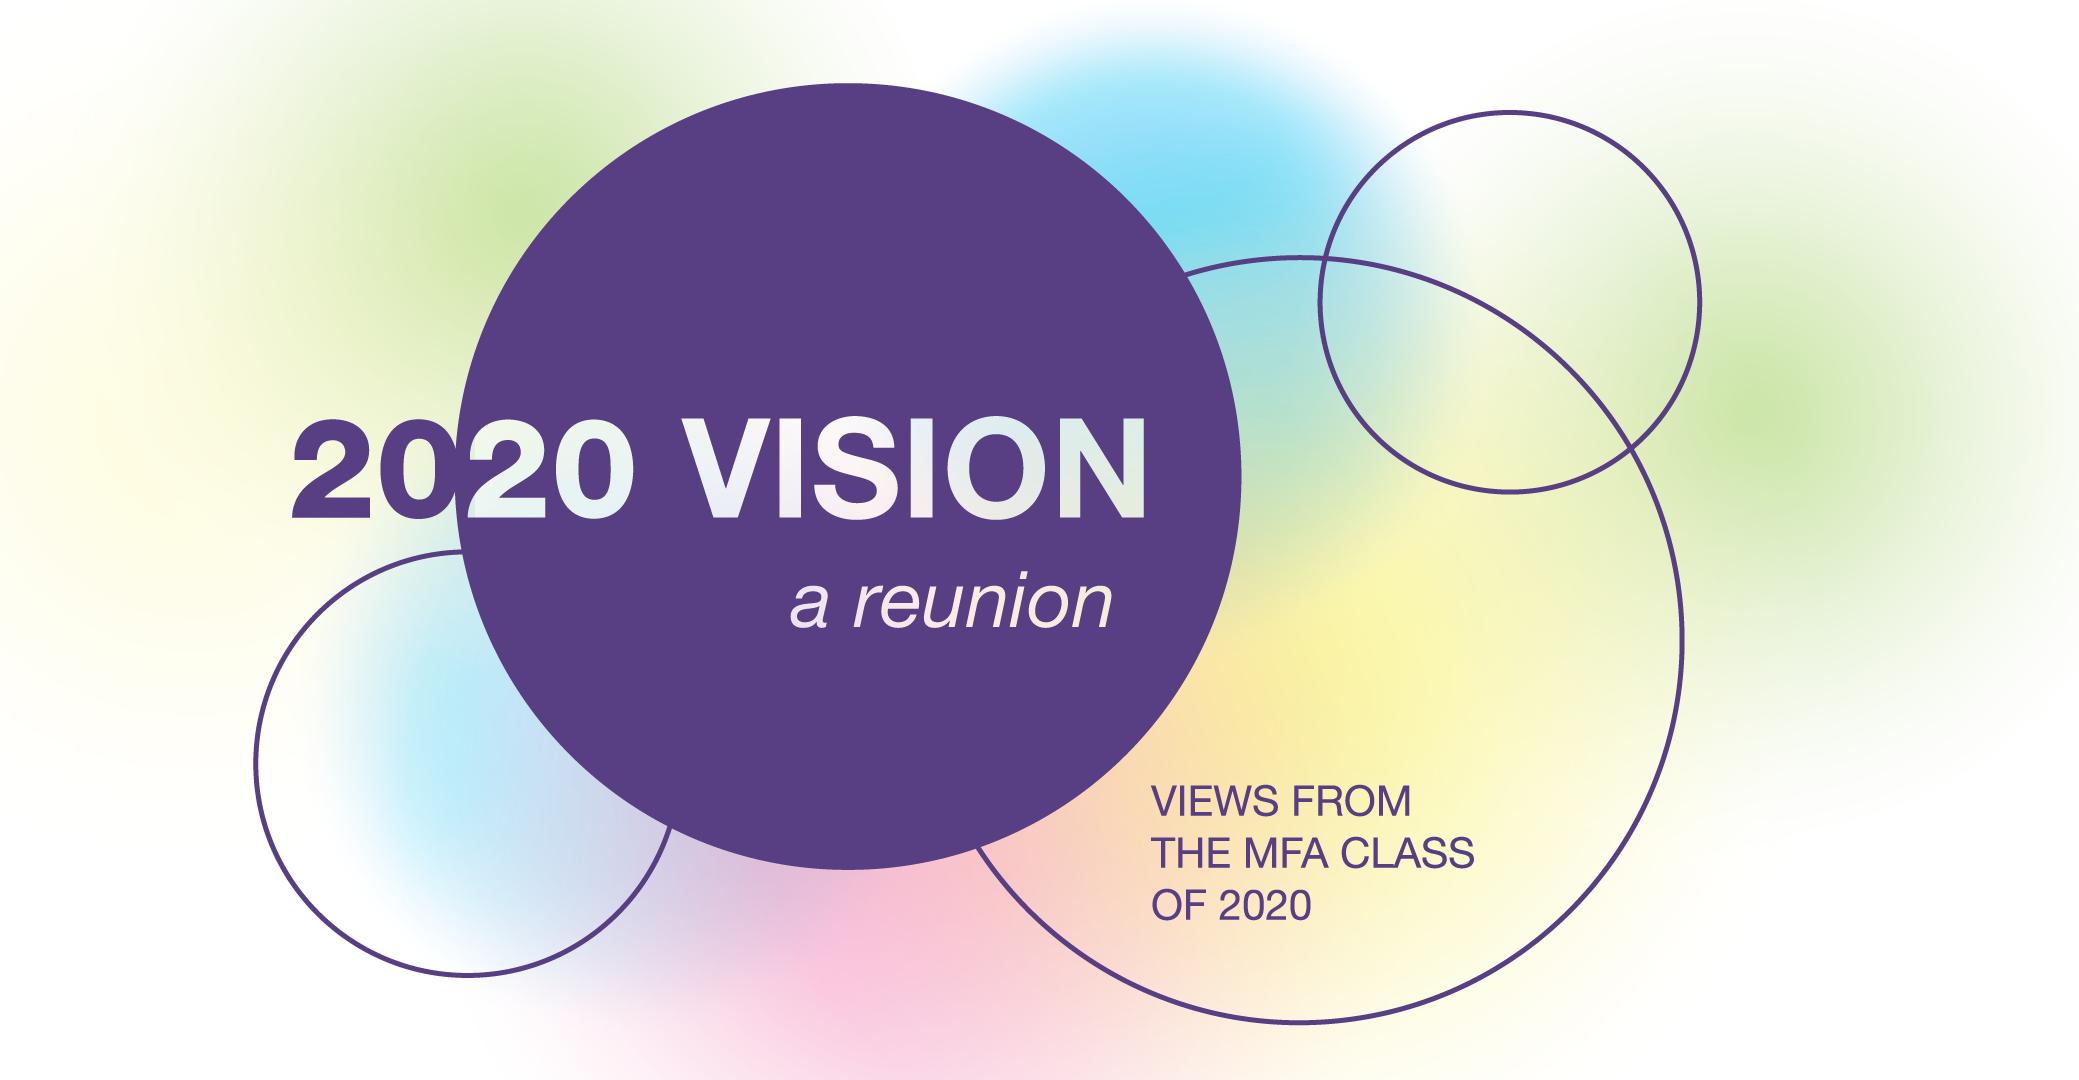 2020Vision_Eventbrite_Draft5.png